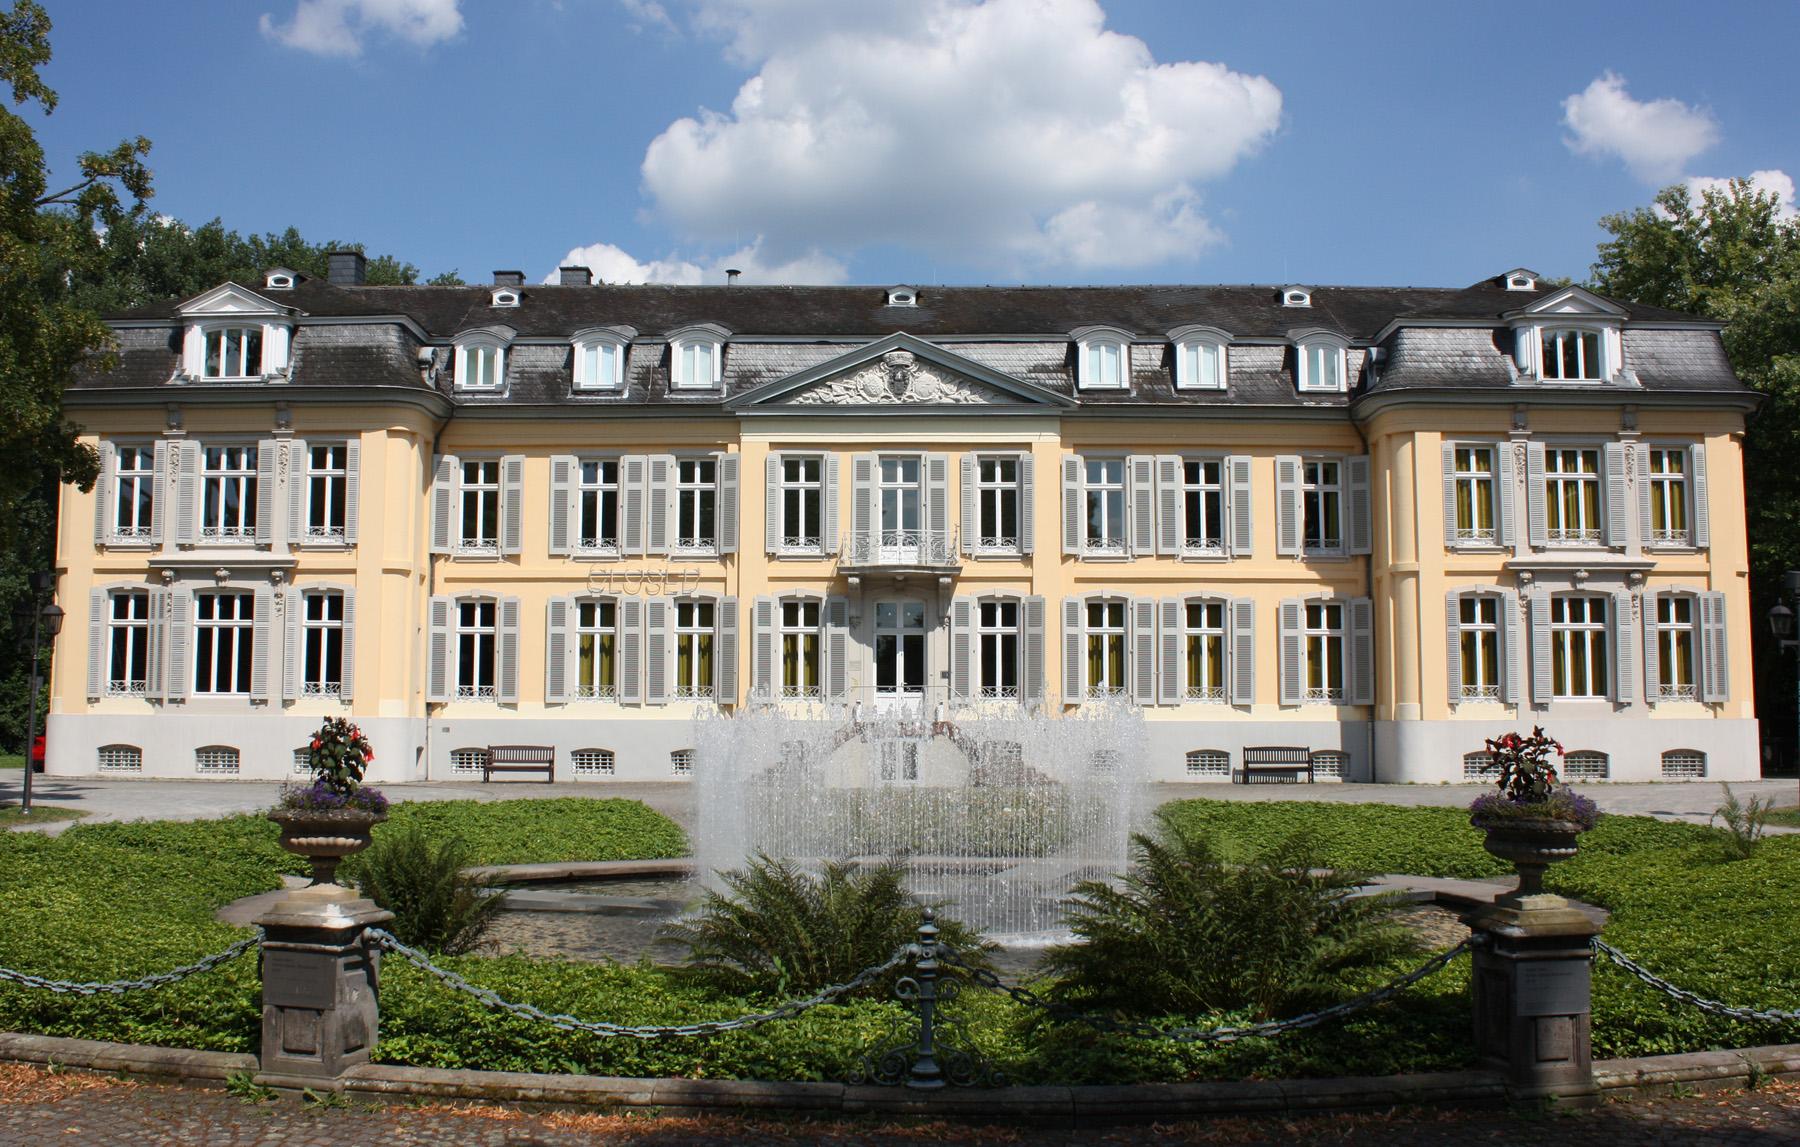 Museum Morsbroich Leverkusen ArtJunk